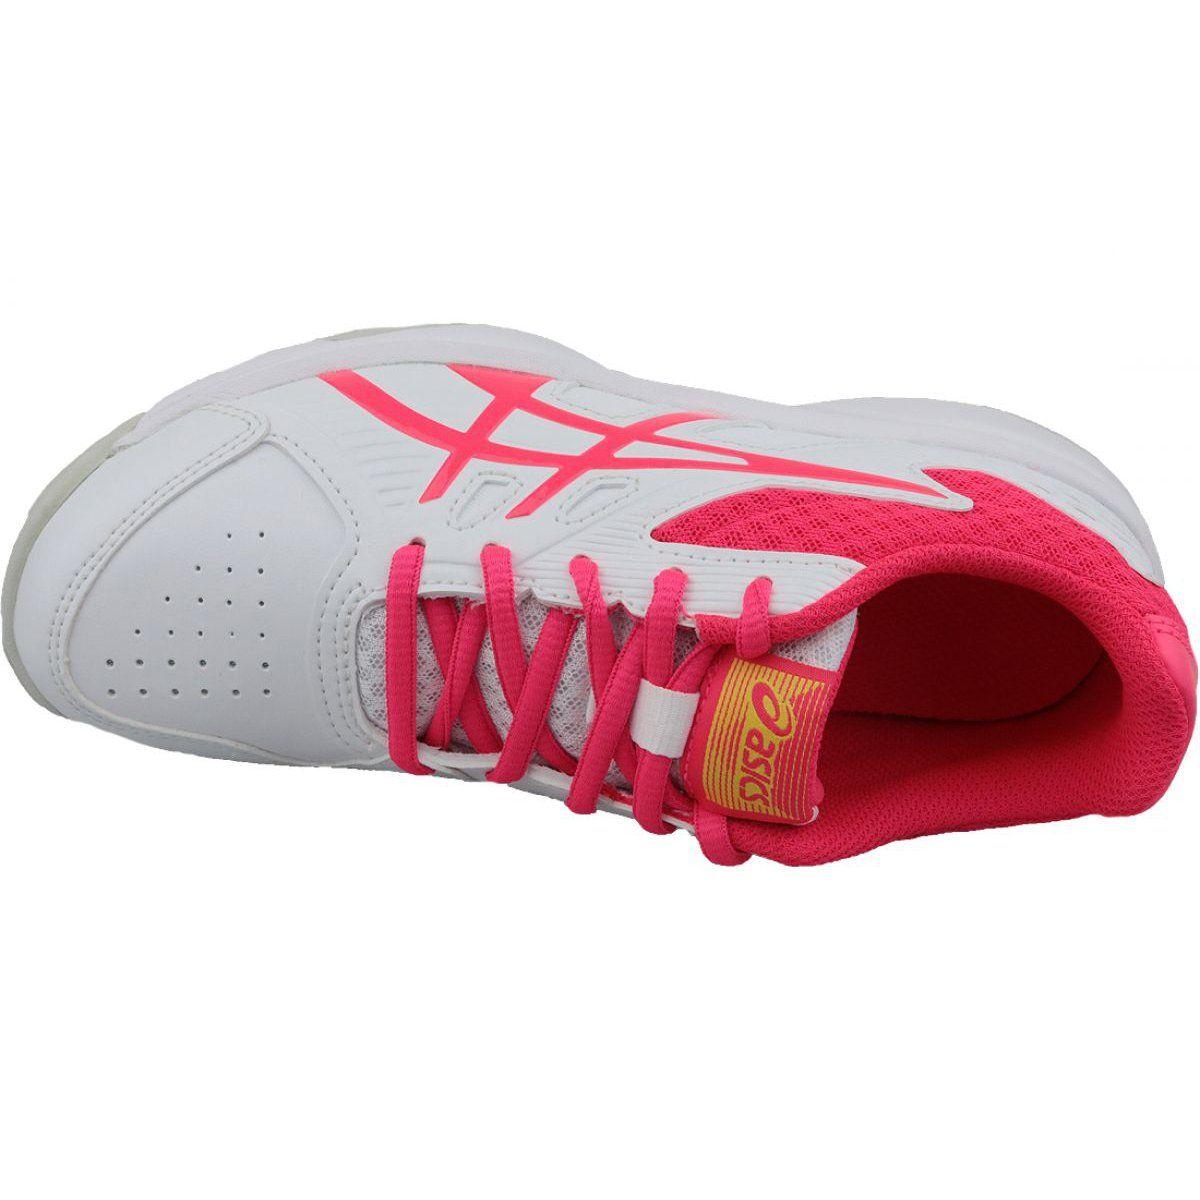 Buty Do Tenisa Asics Court Slide W 1042a030 101 Biale Tennis Shoes Asics Womens Tennis Shoes